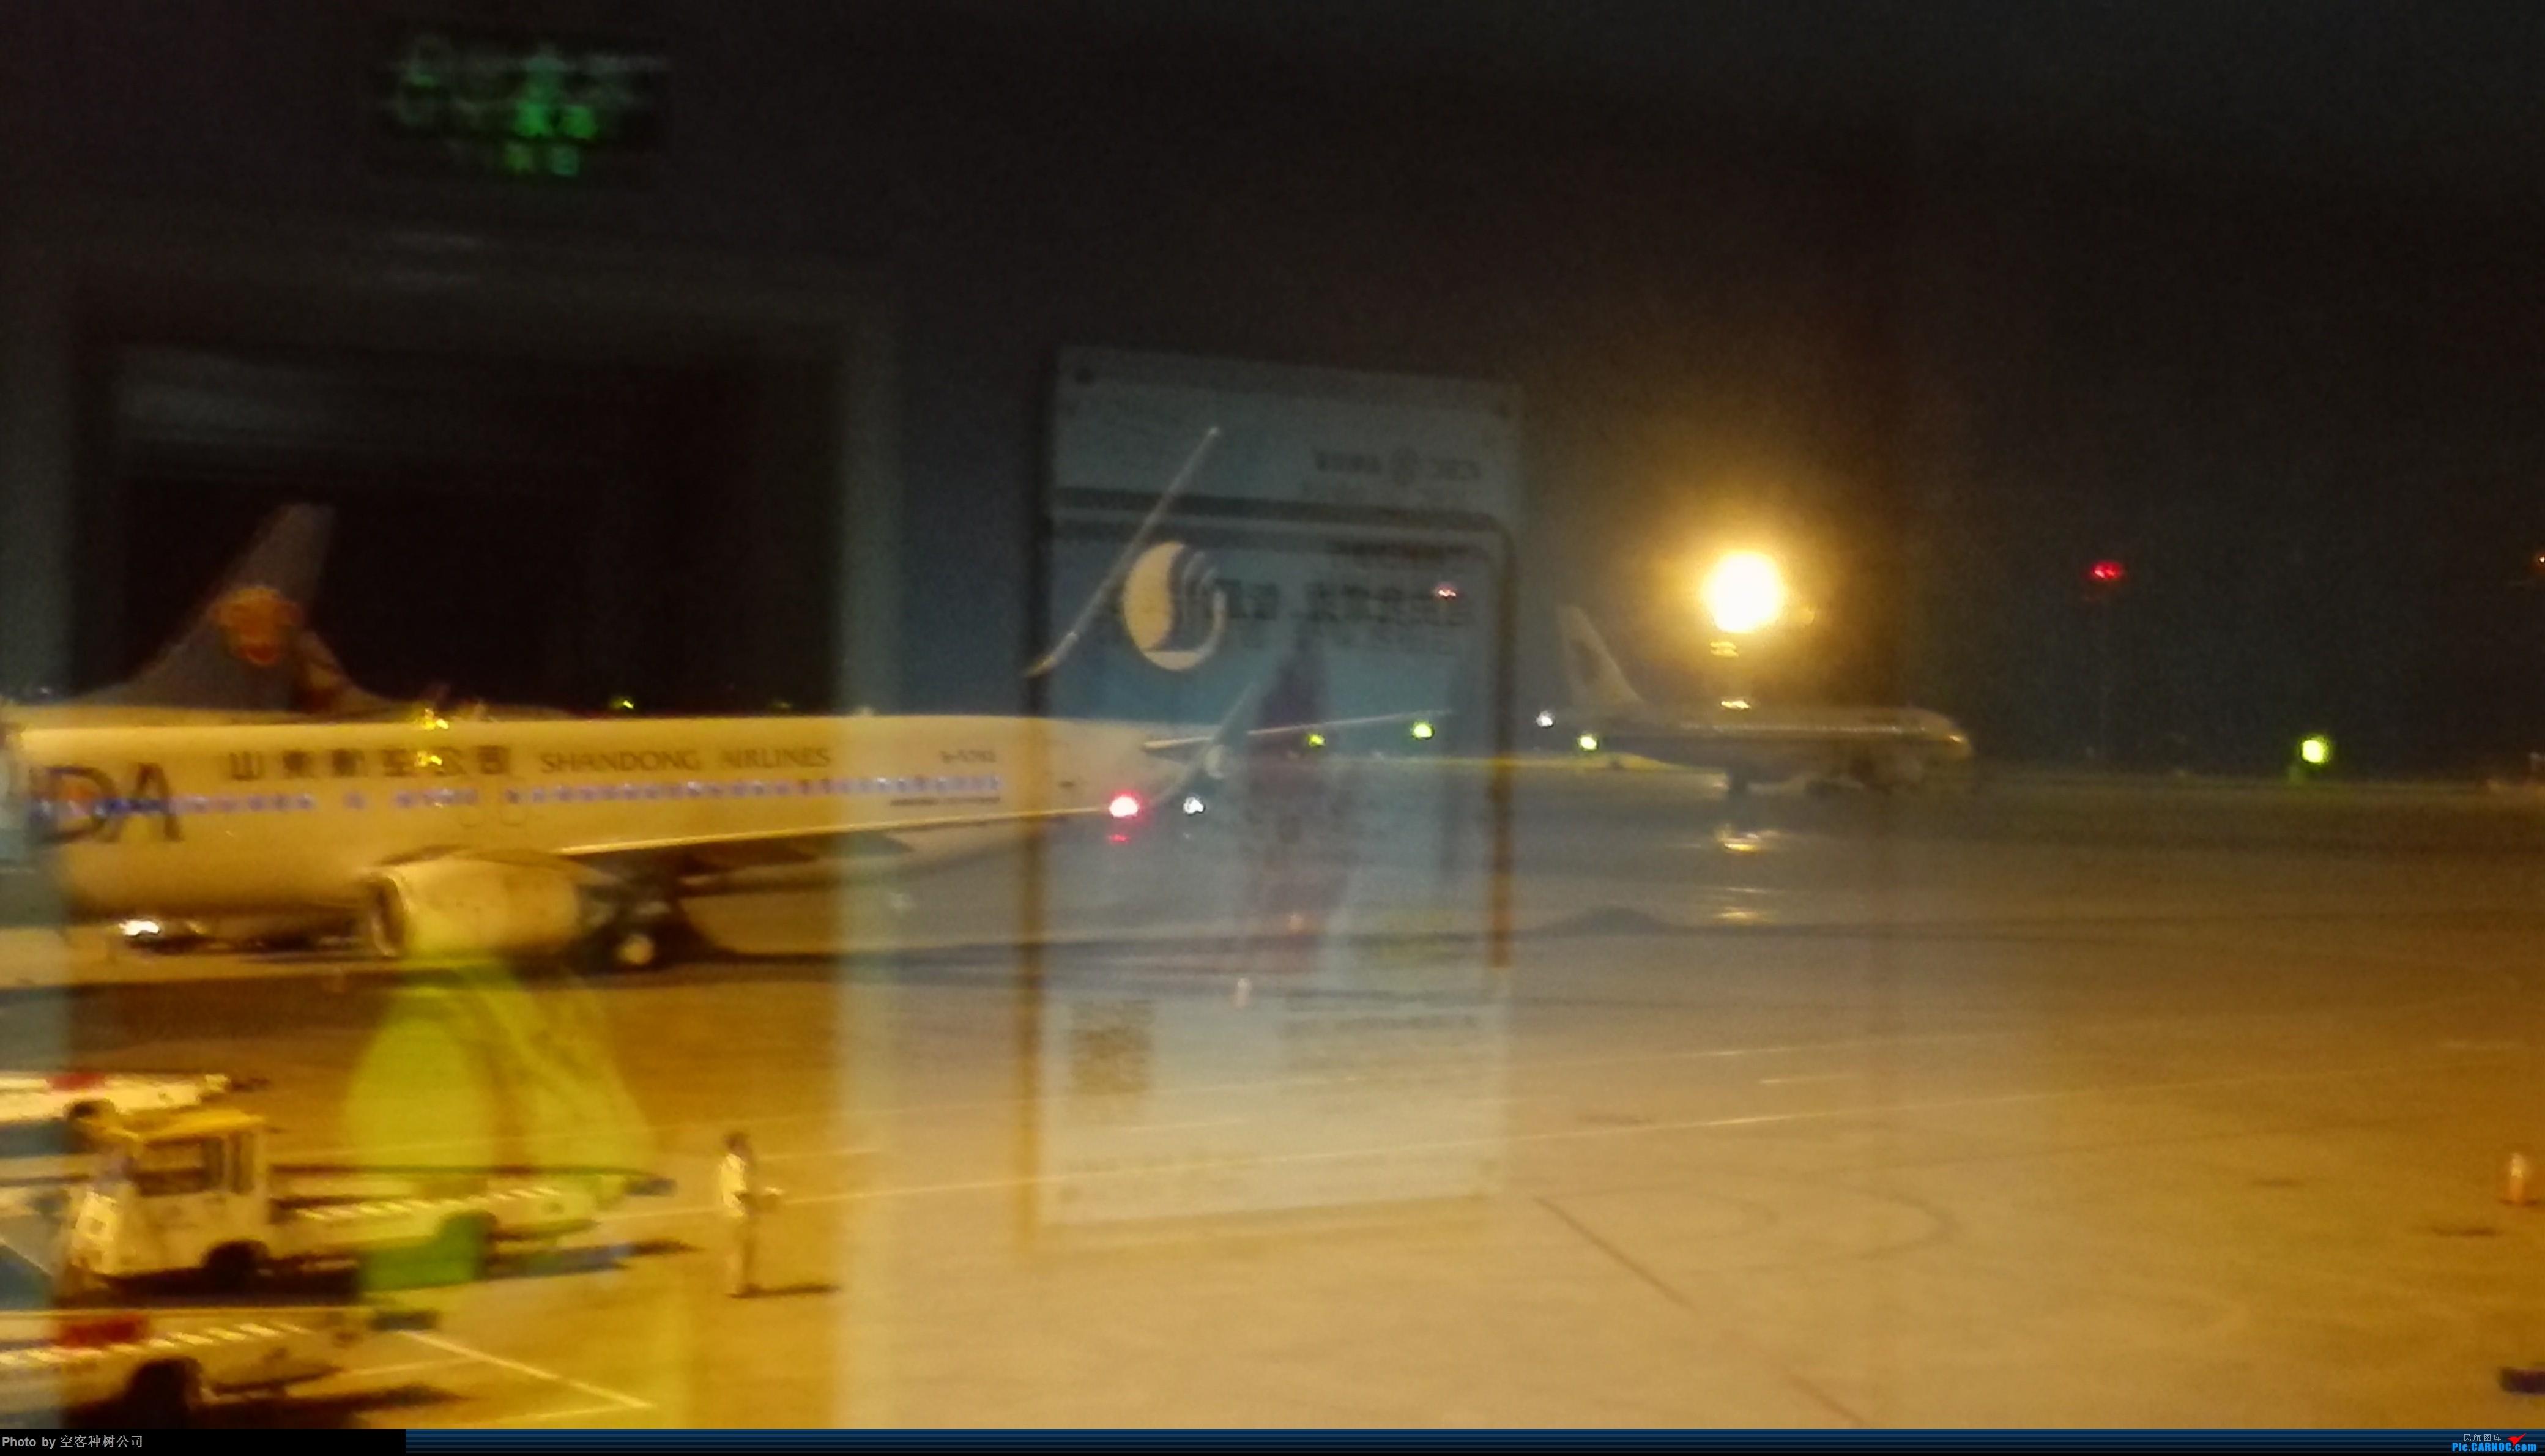 Re:[原创]桂林直飞柬埔寨跟团游2017.07.27----2017.08.01 BOEING 737-800 B-5783 中国桂林两江国际机场